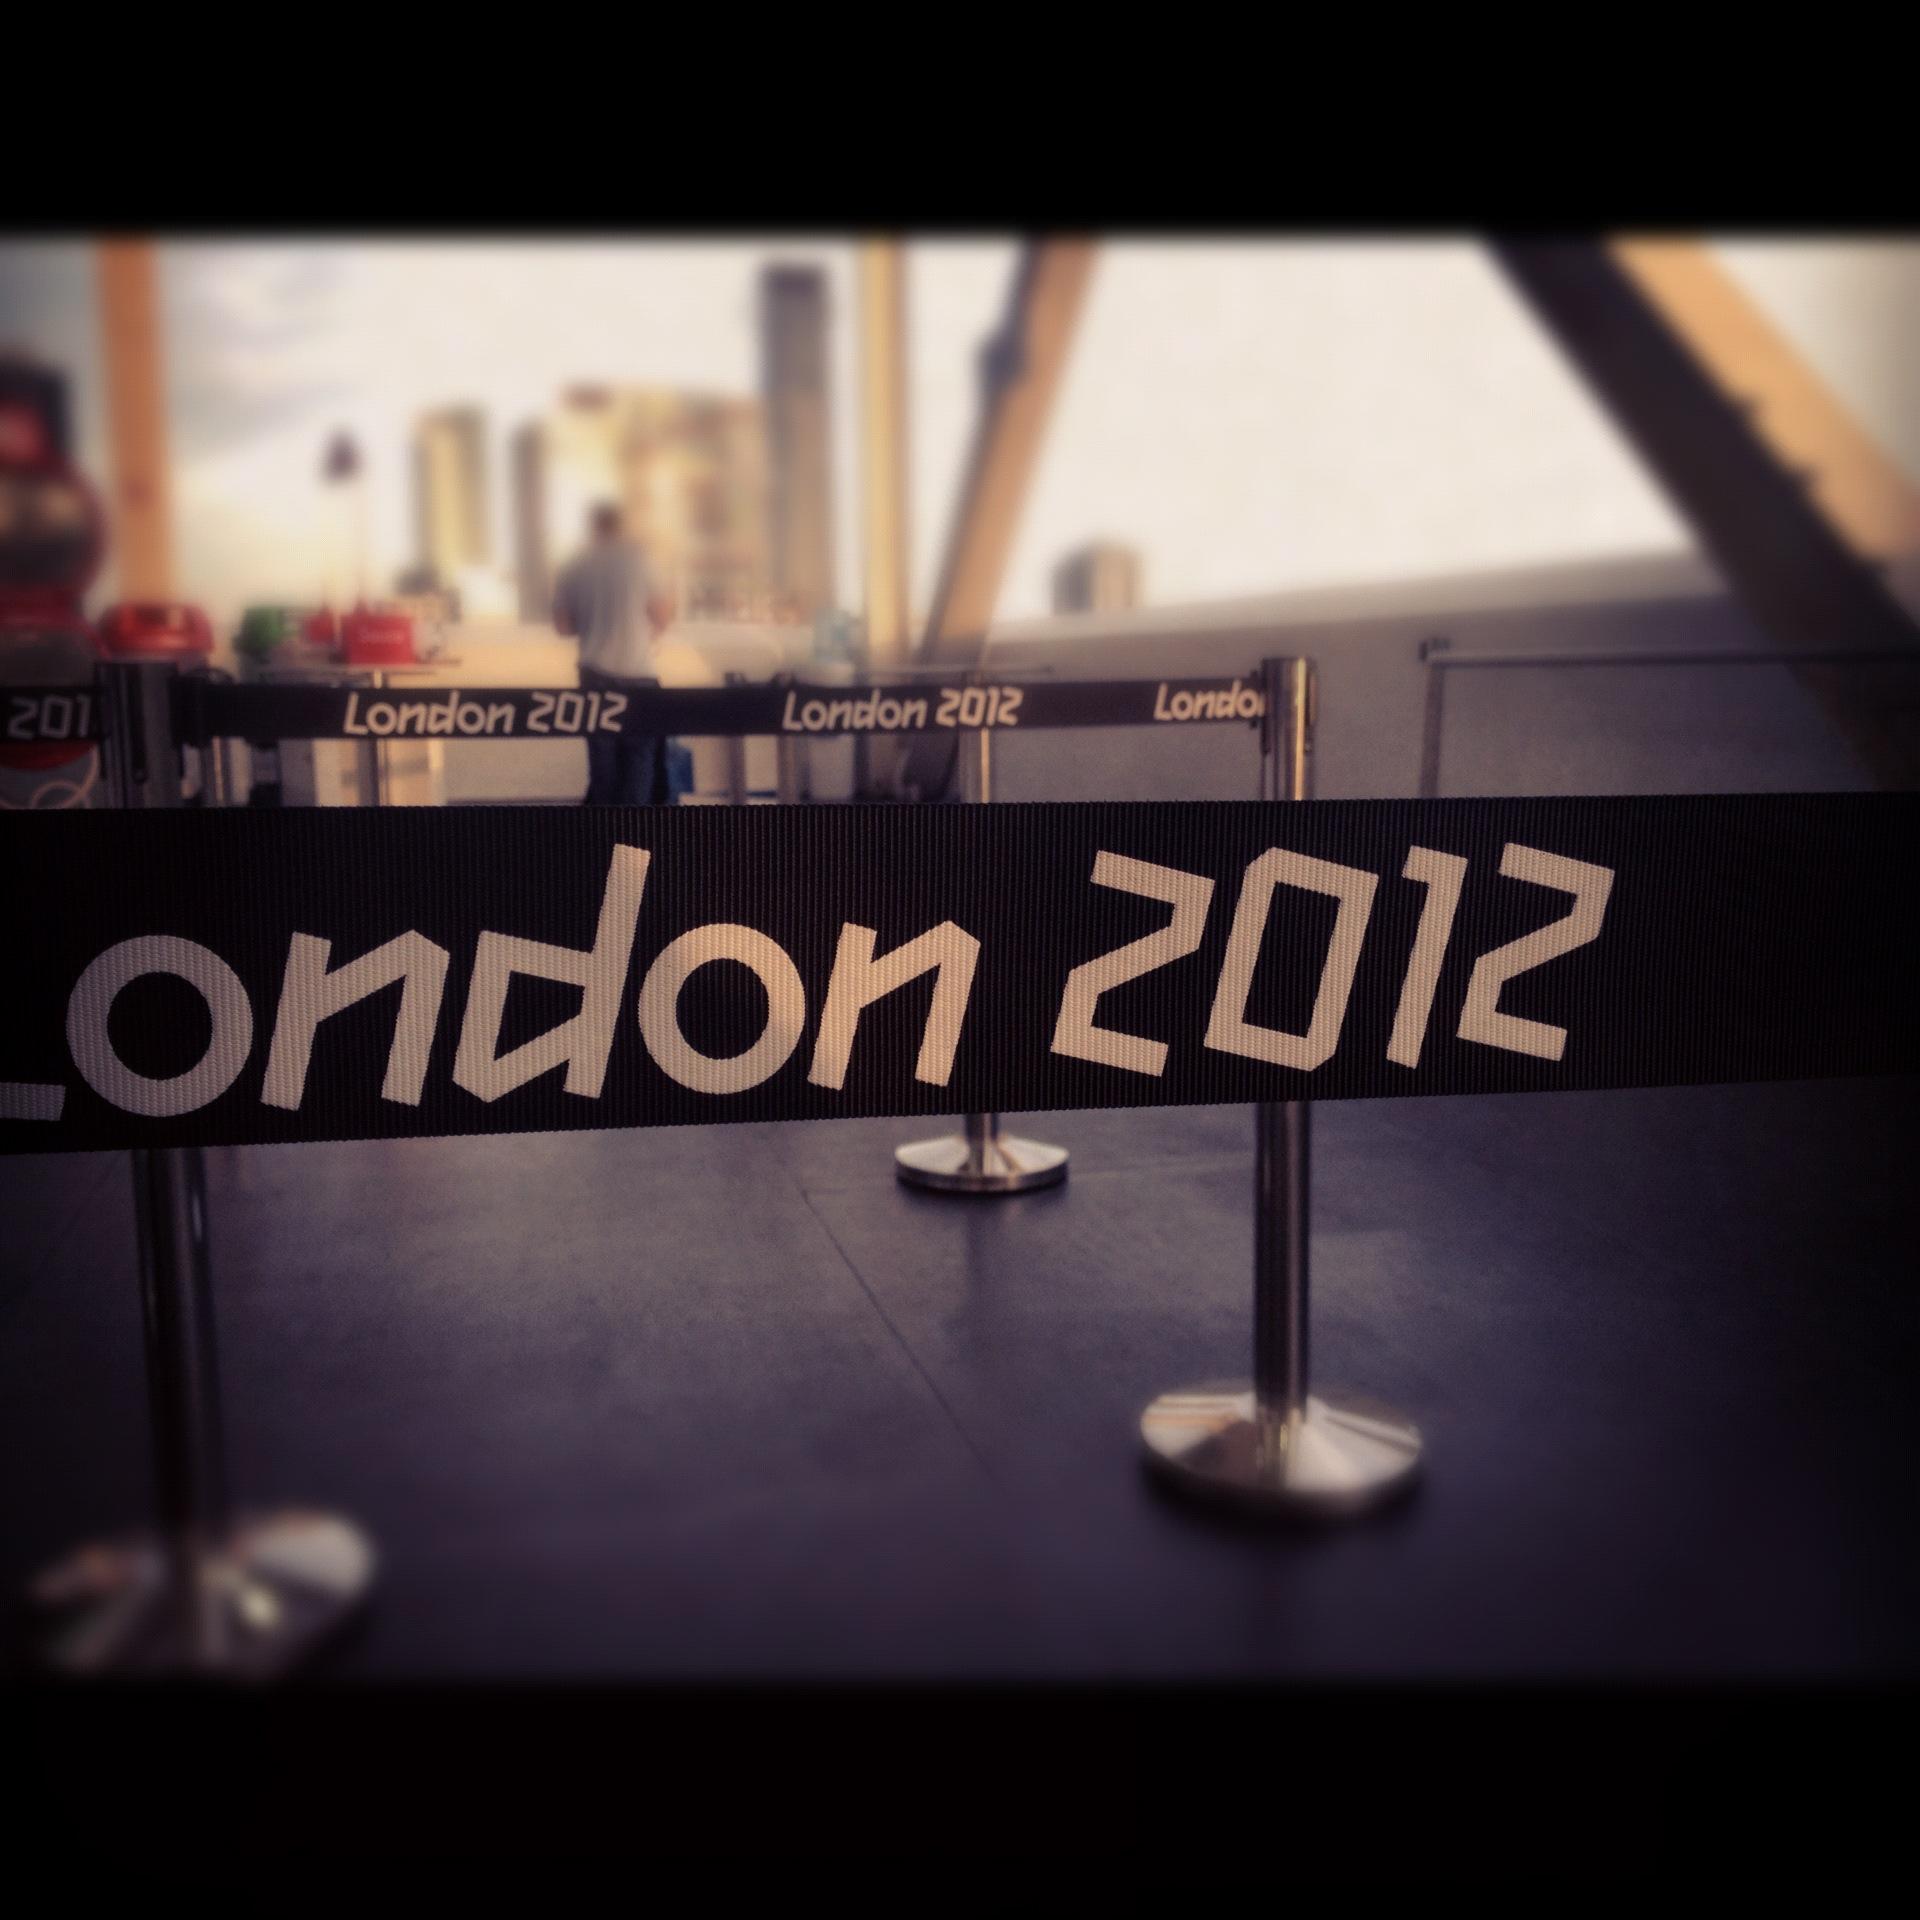 2012-09-06-london2012photo.JPG